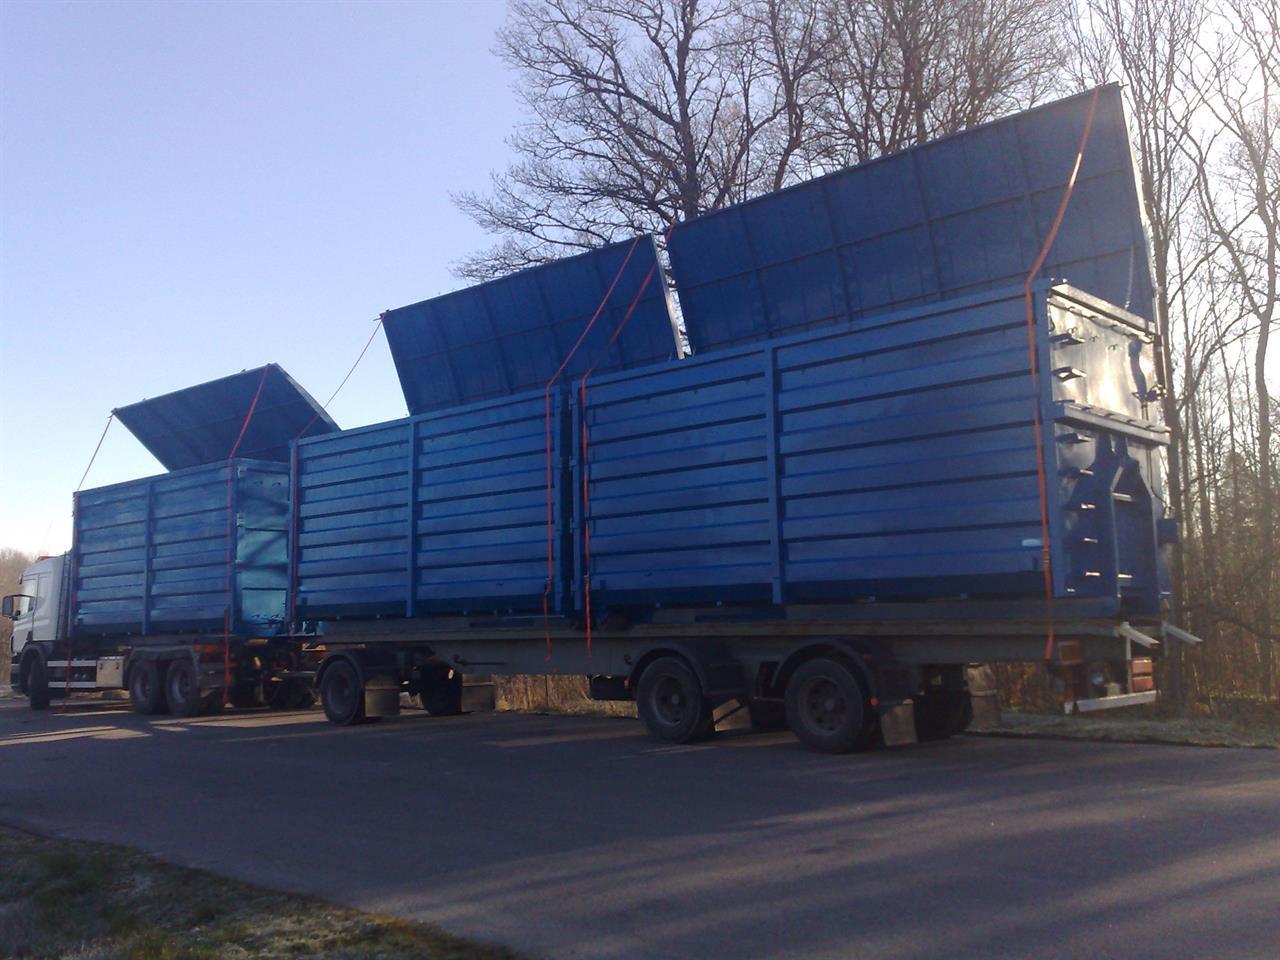 Fliscontainer med öppningsbart tak